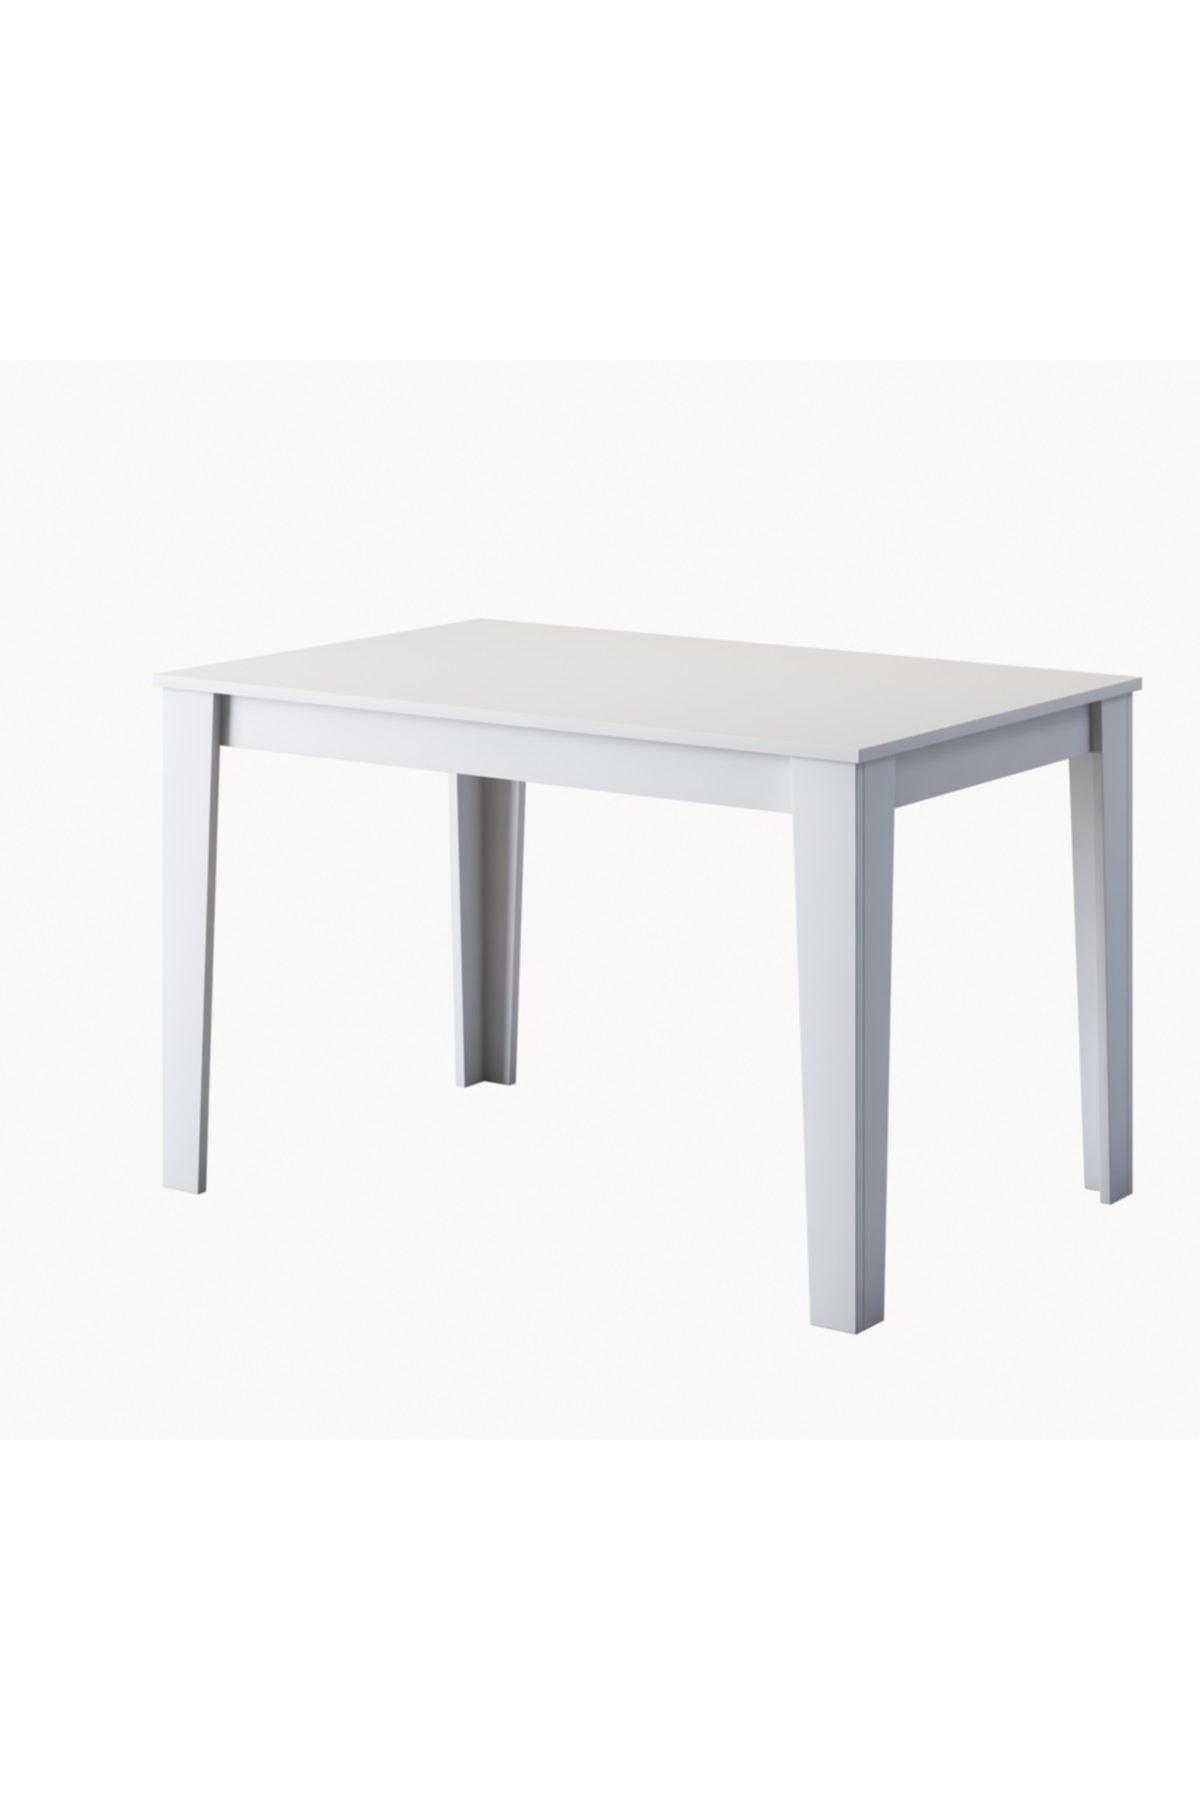 Rani T1 Mutfak Masası 110 cm Beyaz M2